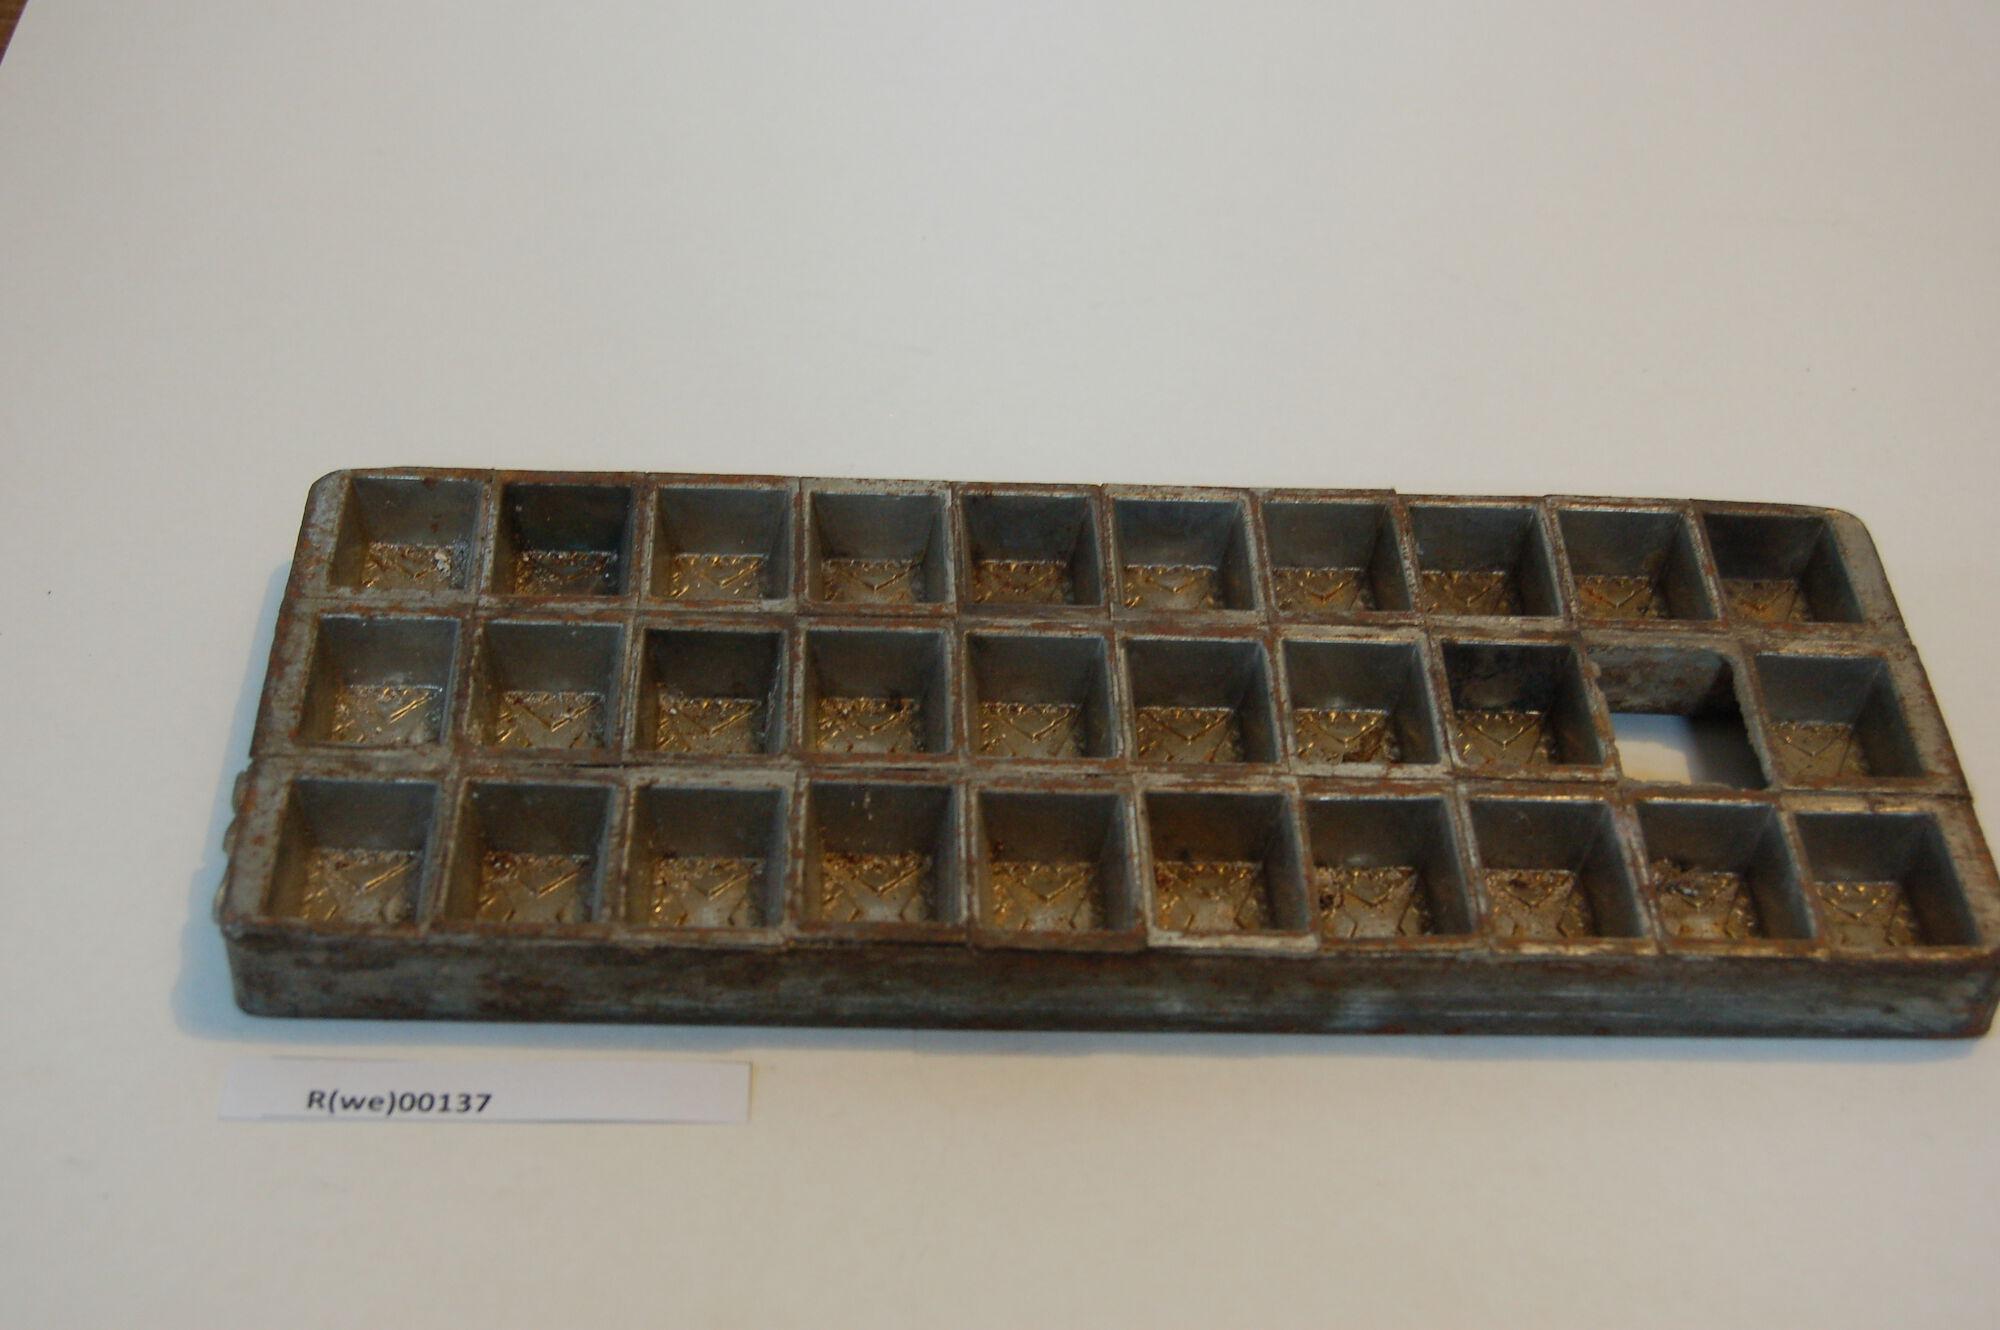 Ronse MUST: bakkersgereedschap R(we)00137.JPG